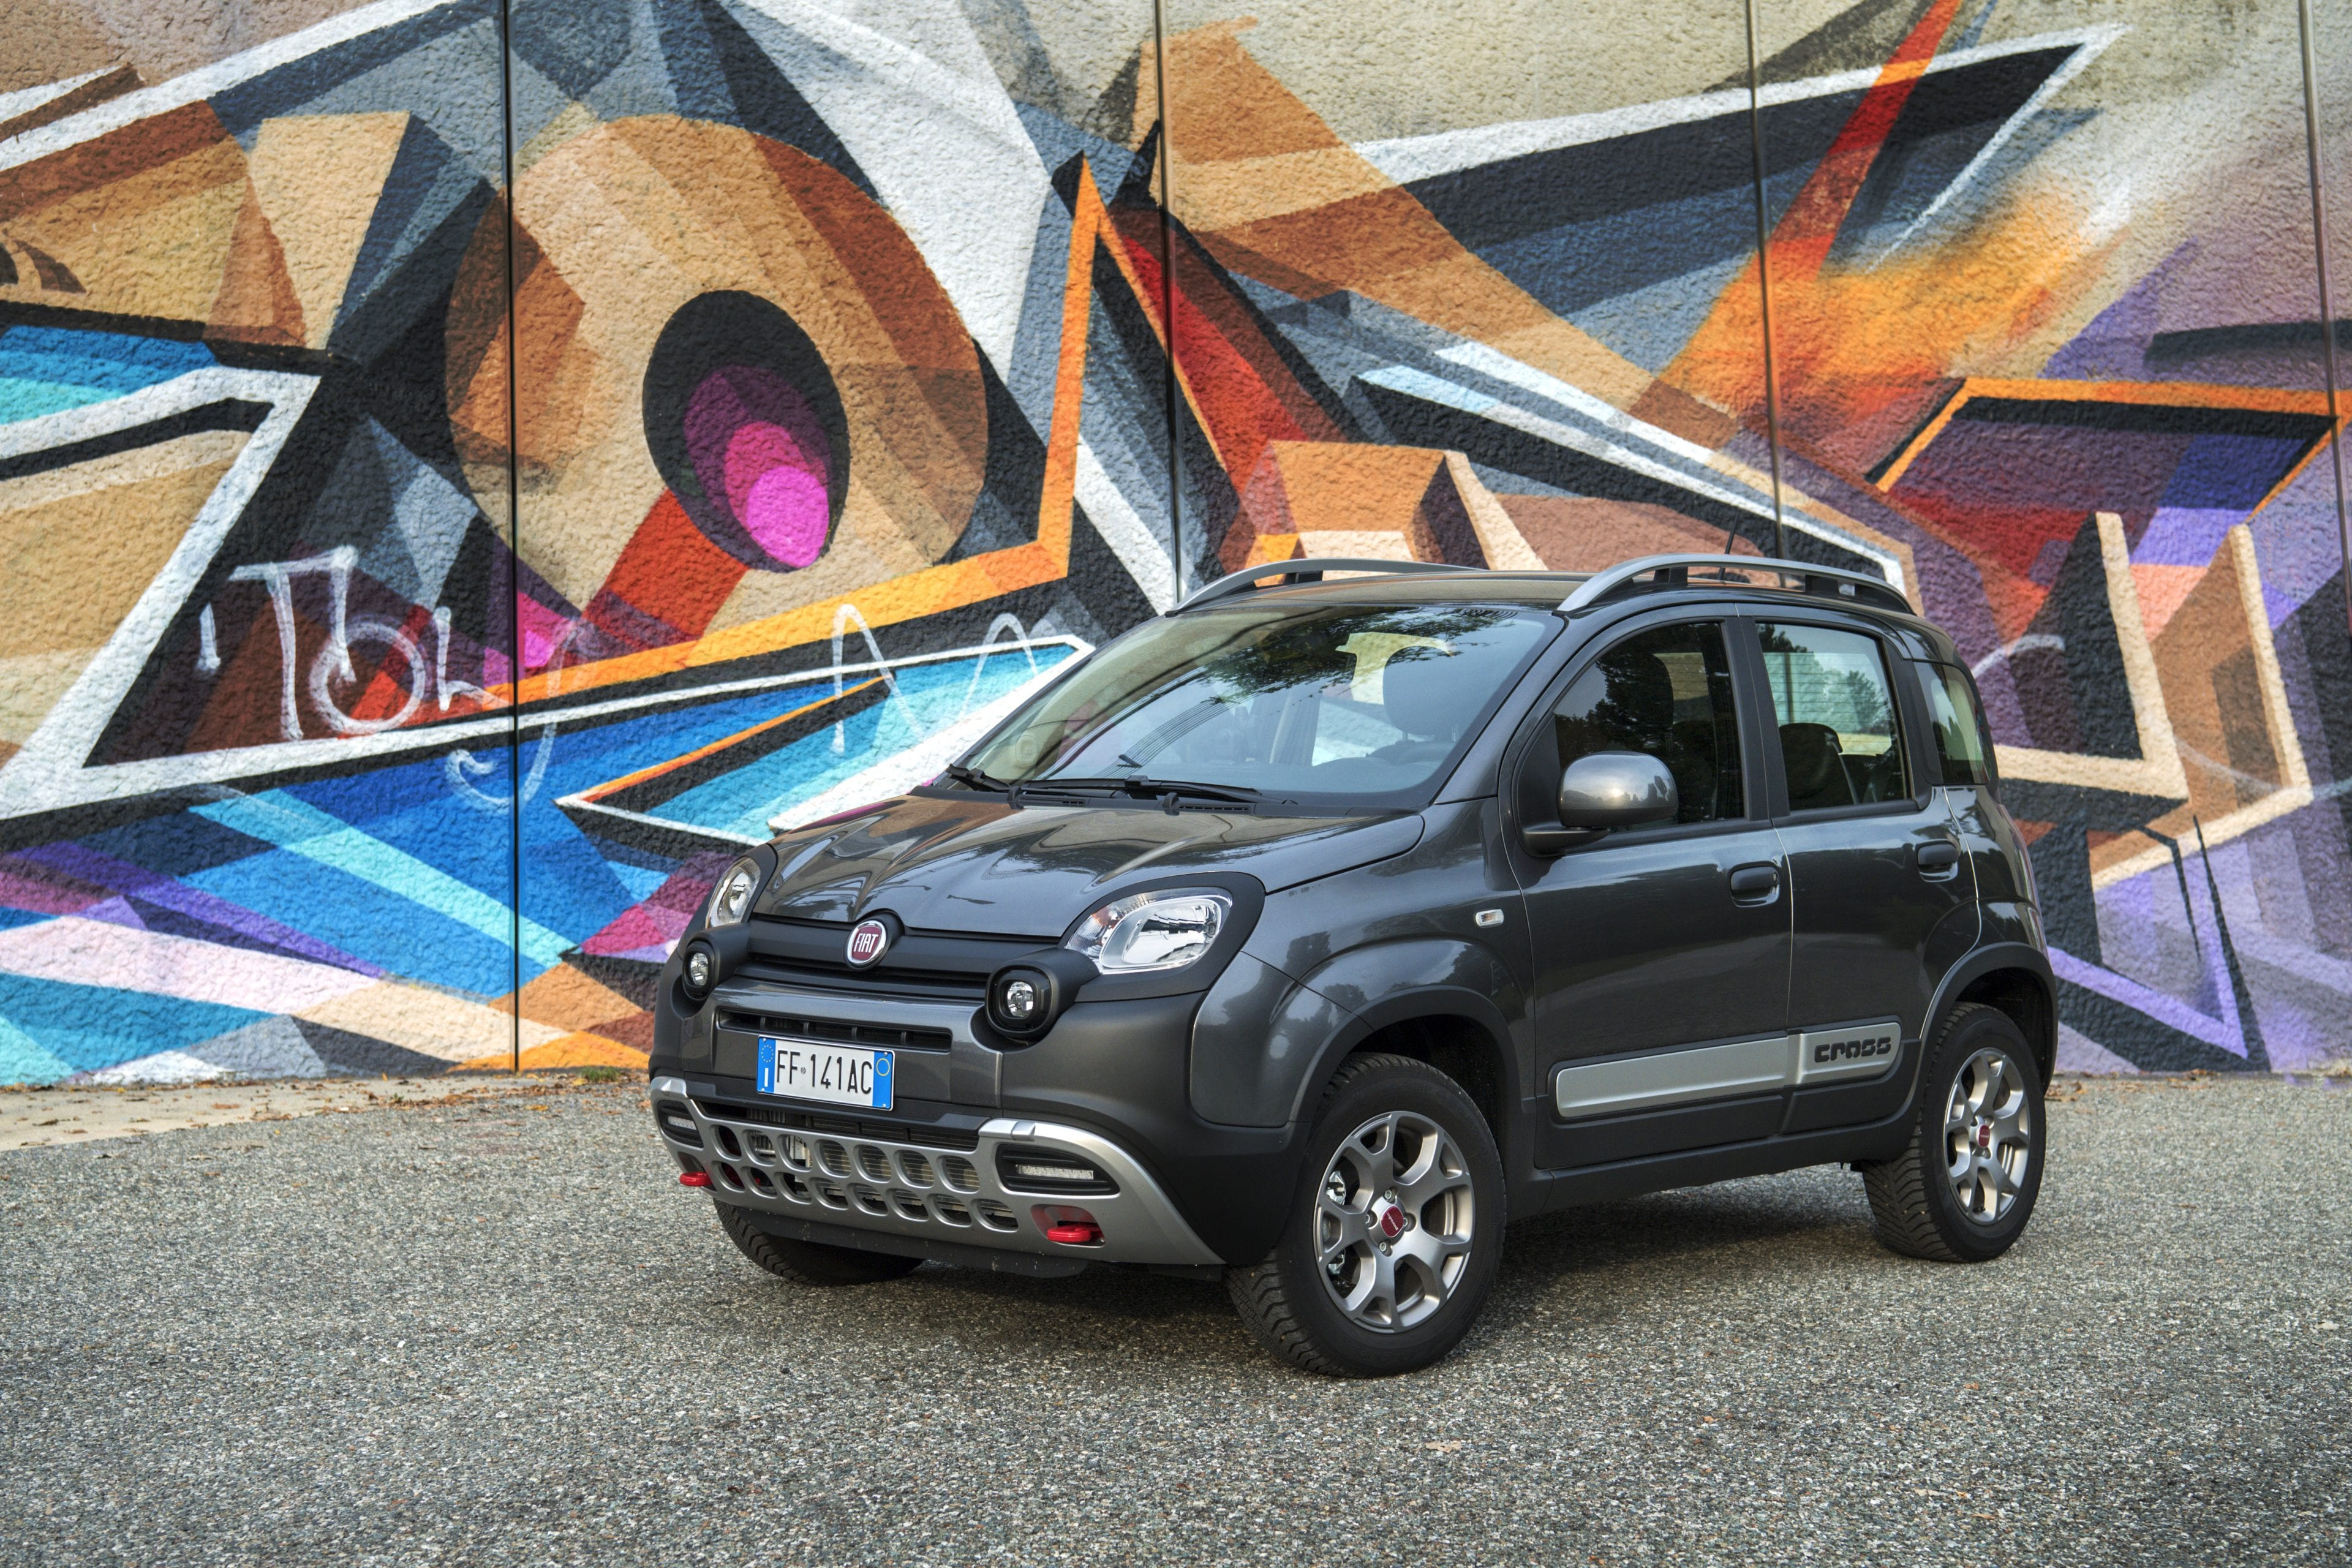 Fiat Panda 4x4 grafiti